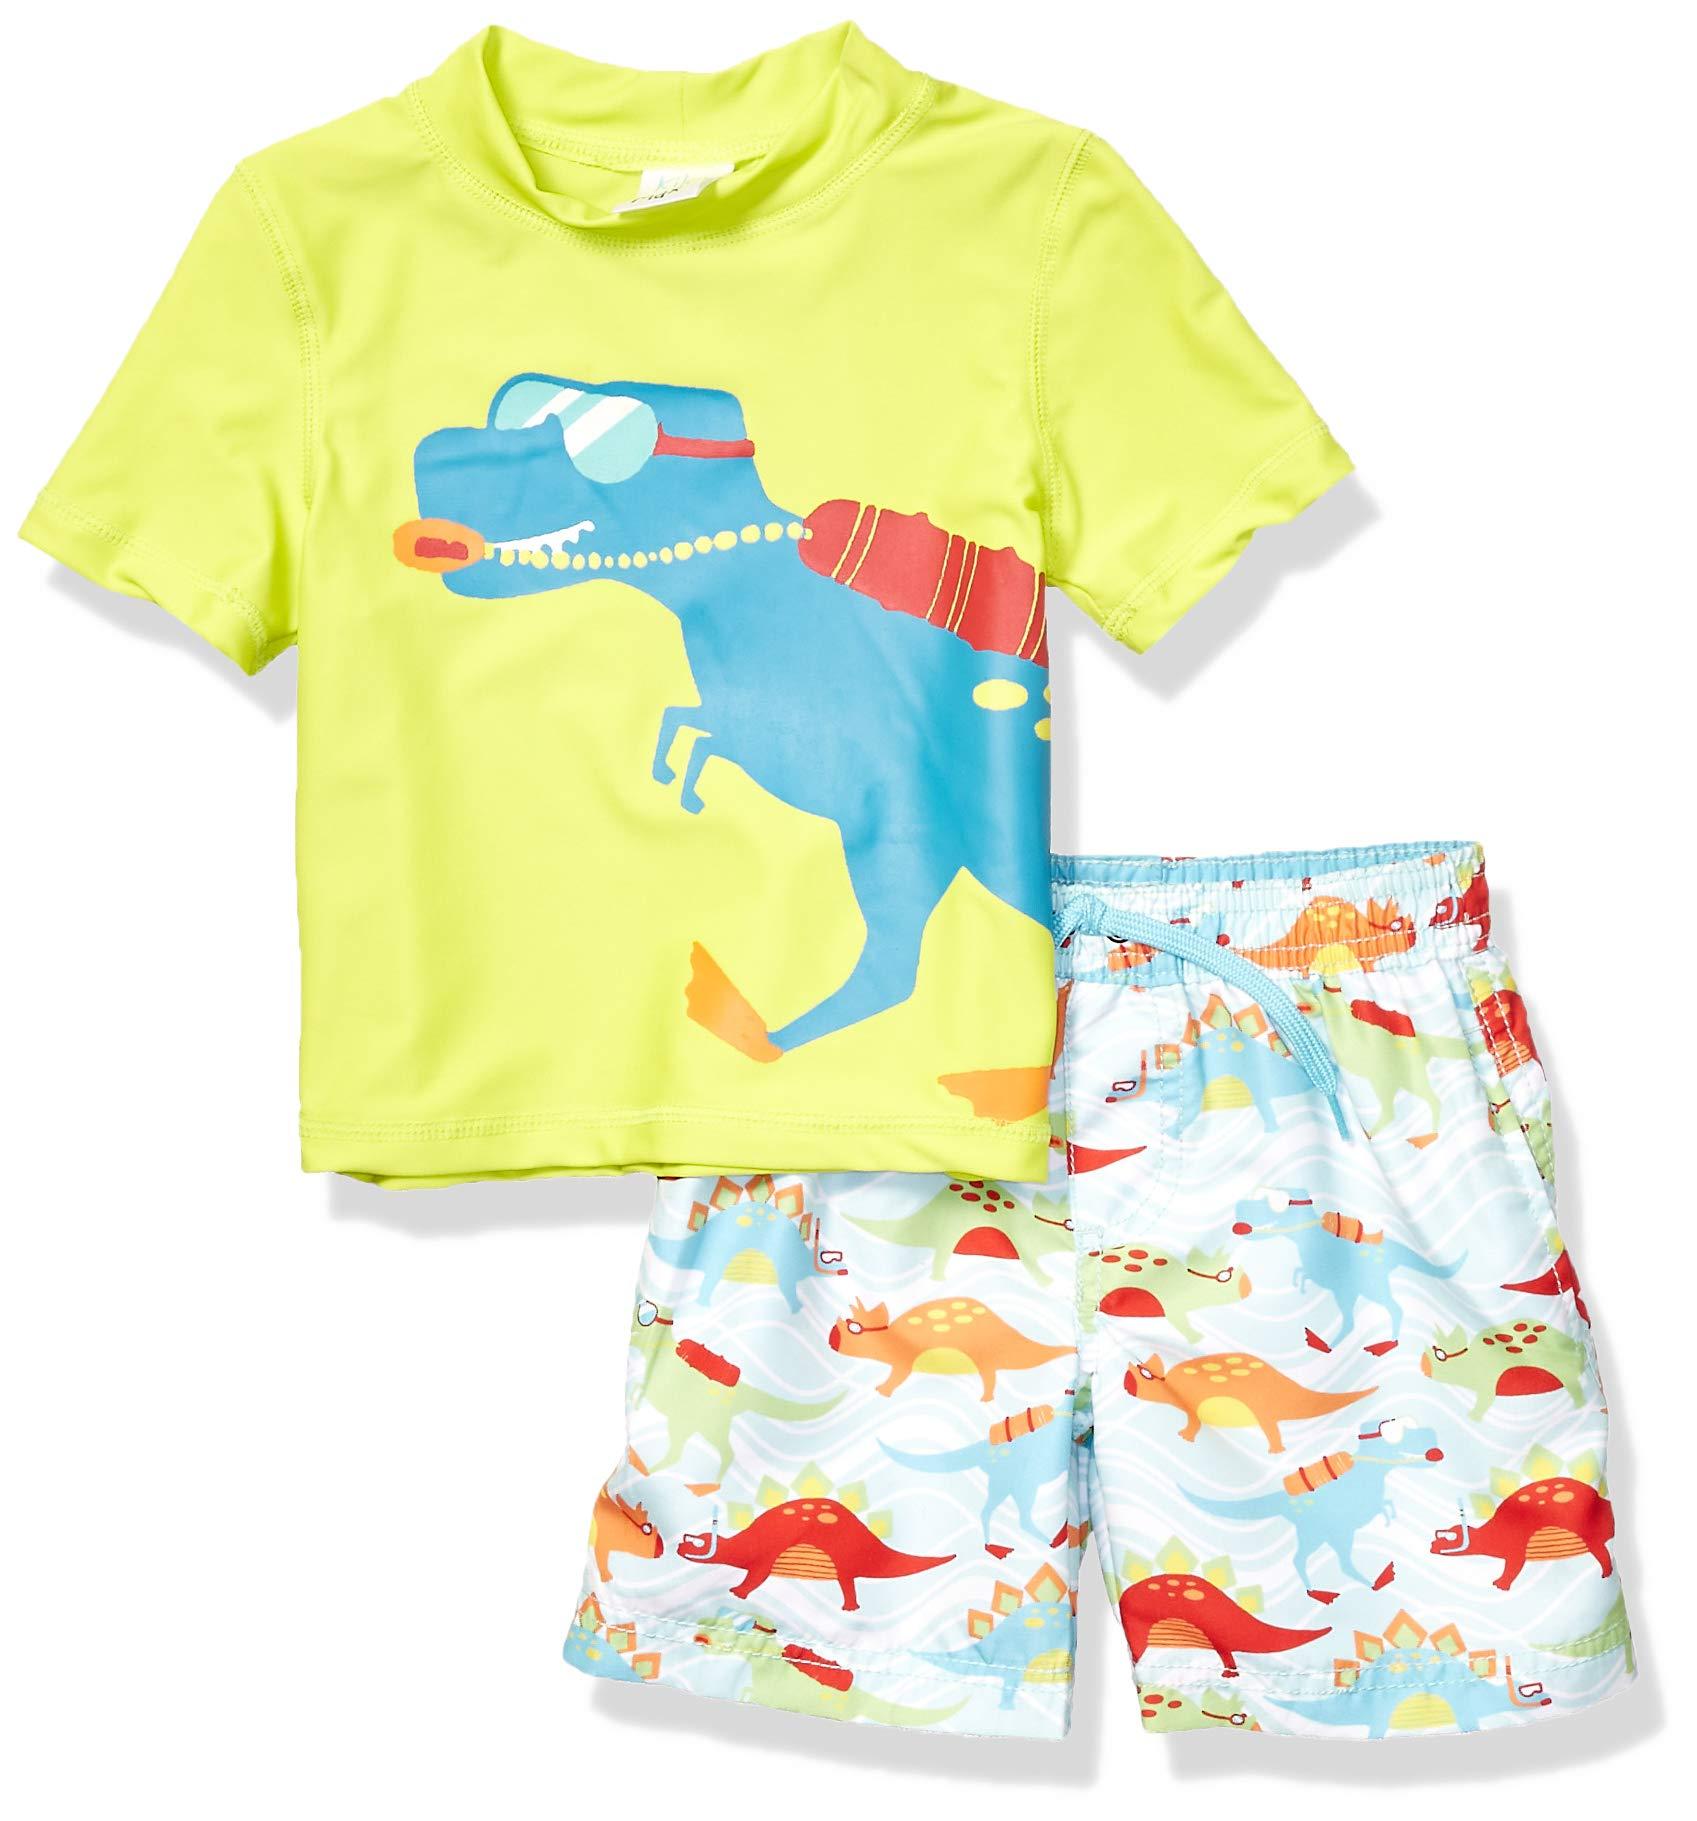 KIKO & MAX Toddler Boys' Swimsuit Set with Short Sleeve Rashguard Swim Shirt, Dinosaur Lifeguard Green, 2T